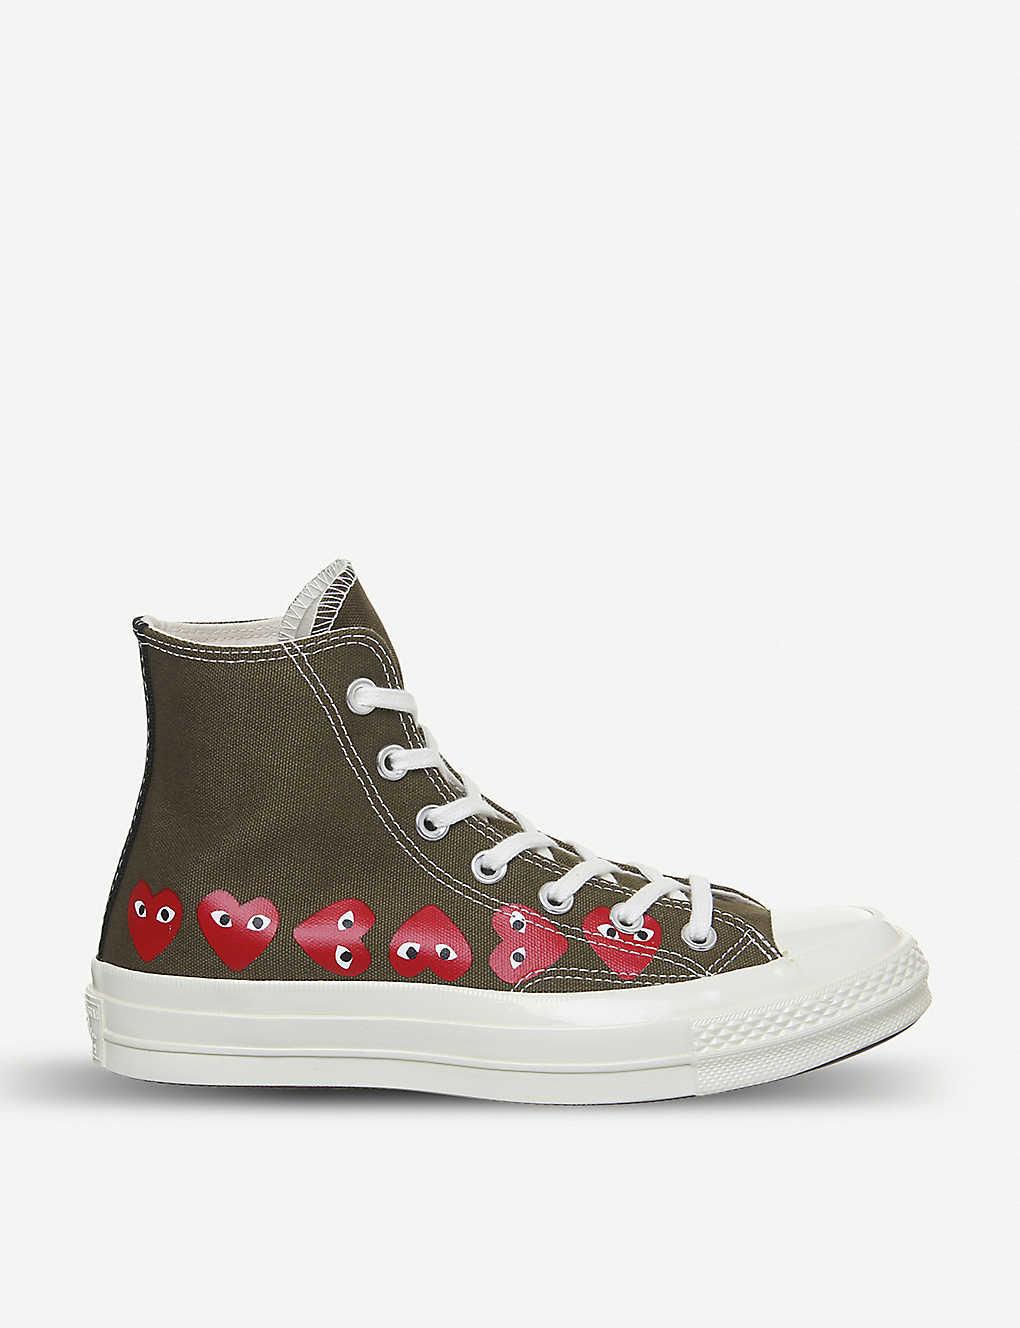 Comme des Garçons x Converse 心形印花帆布運動鞋 原價£115,現特價£92.16